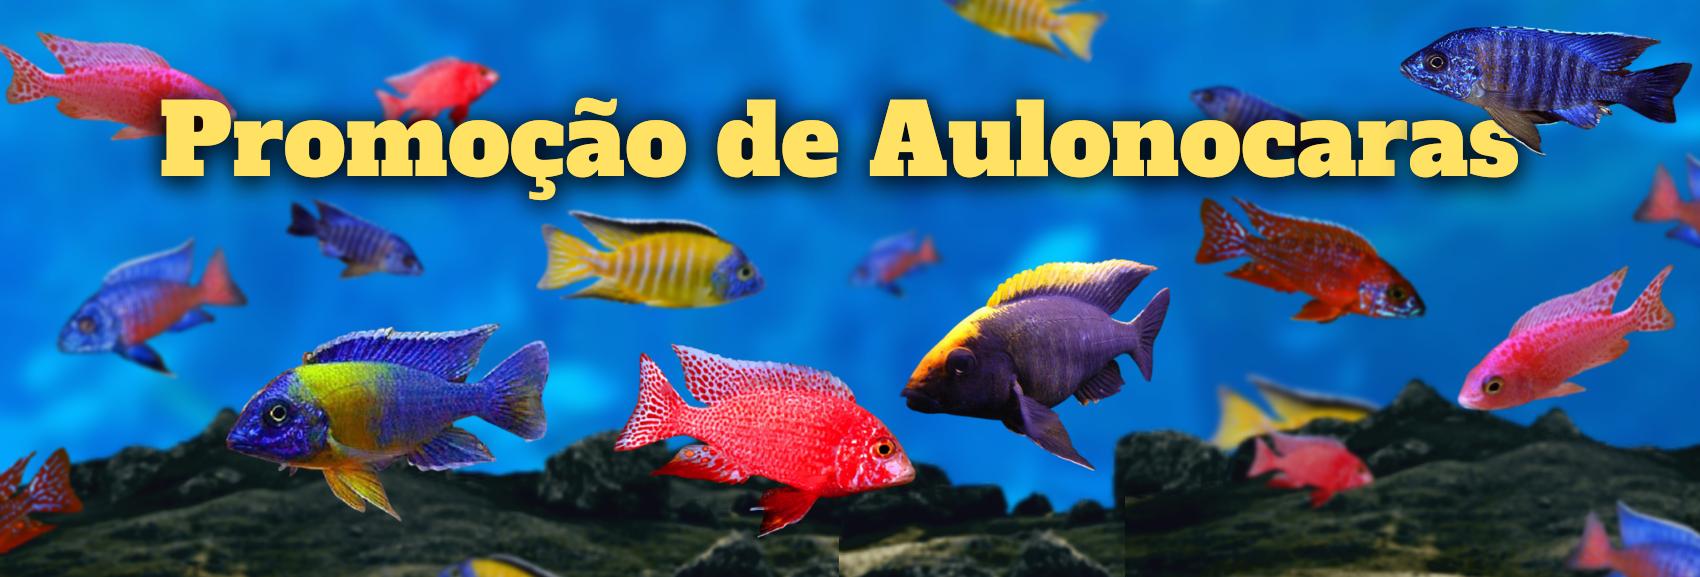 https://www.rsdiscus.com.br/loja/busca.php?loja=102848&palavra_busca=aulonocara